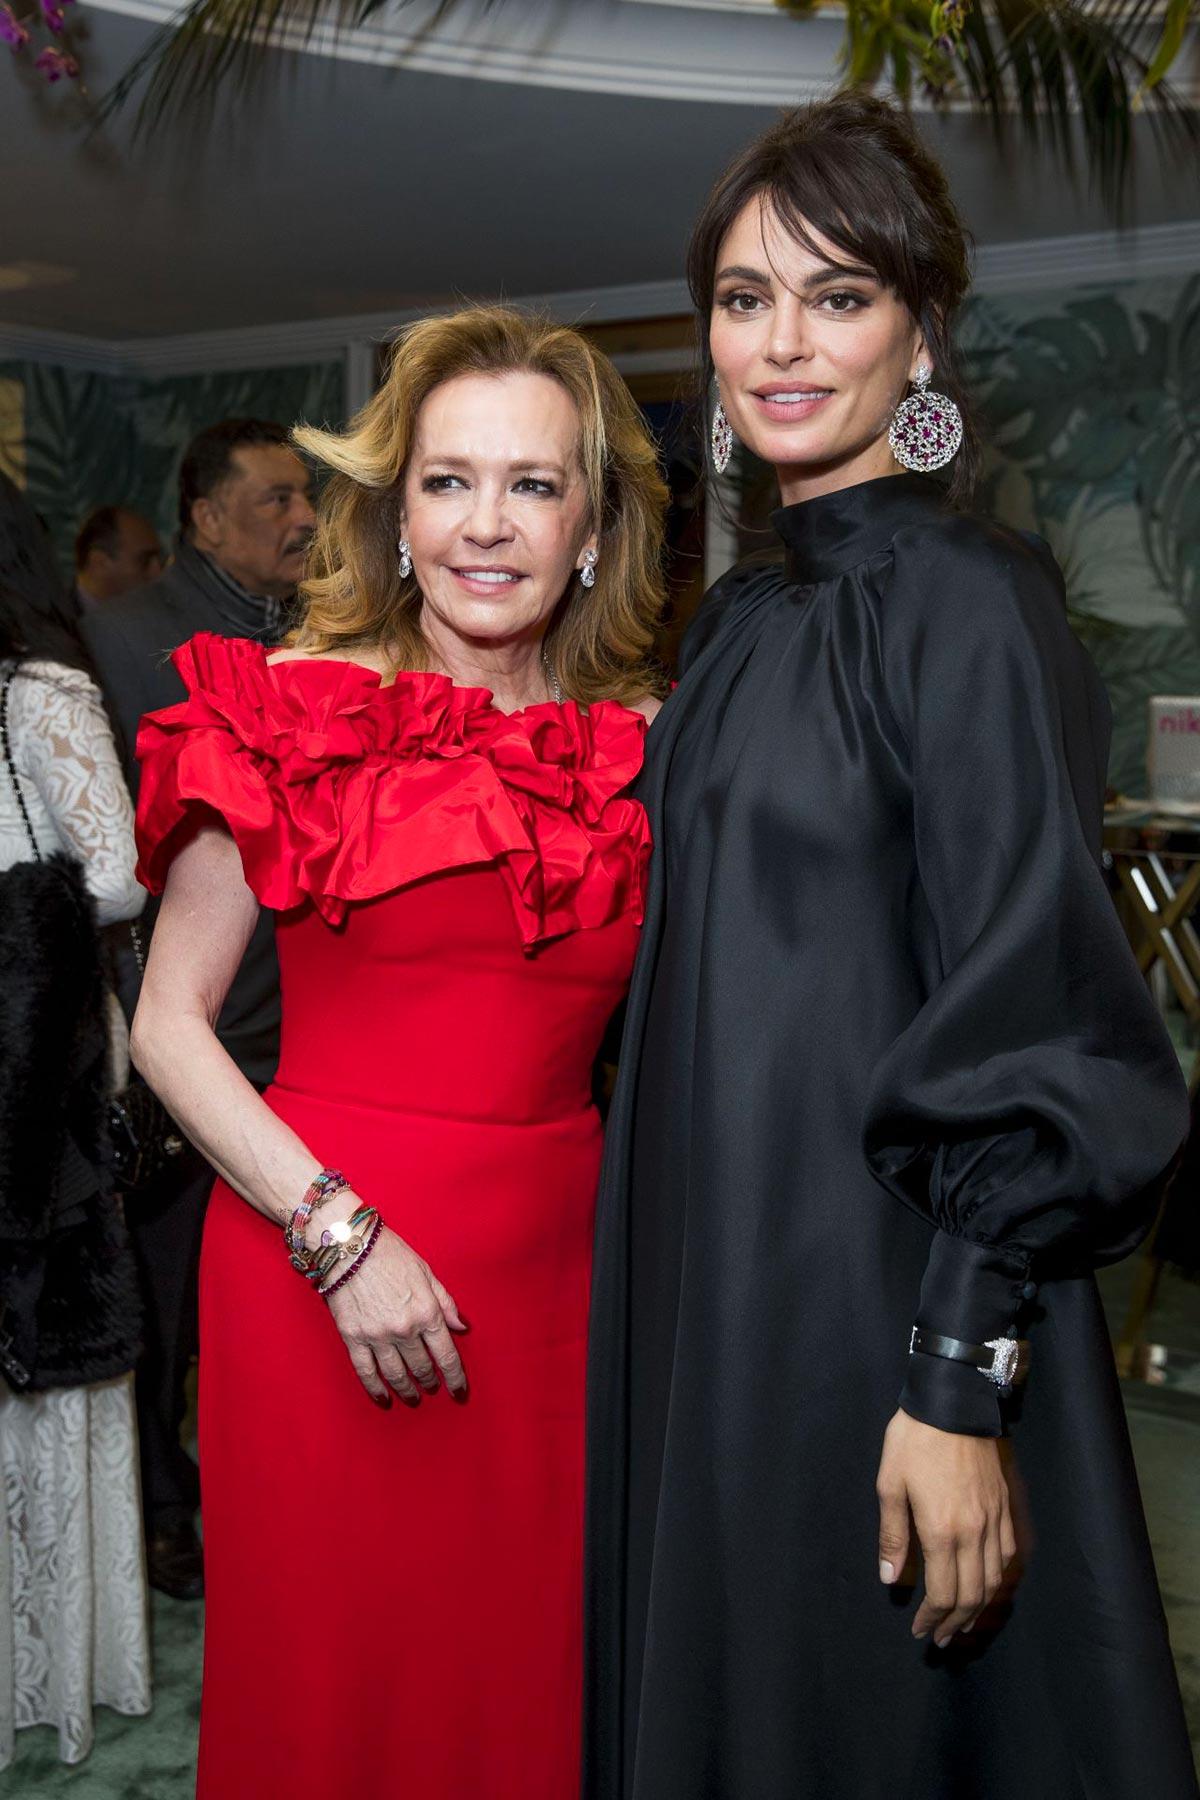 Cannes 2018 - Trophee Chopard - Caroline Scheufele and Catrinel Marlon - Hair and makeup Massimo Serini